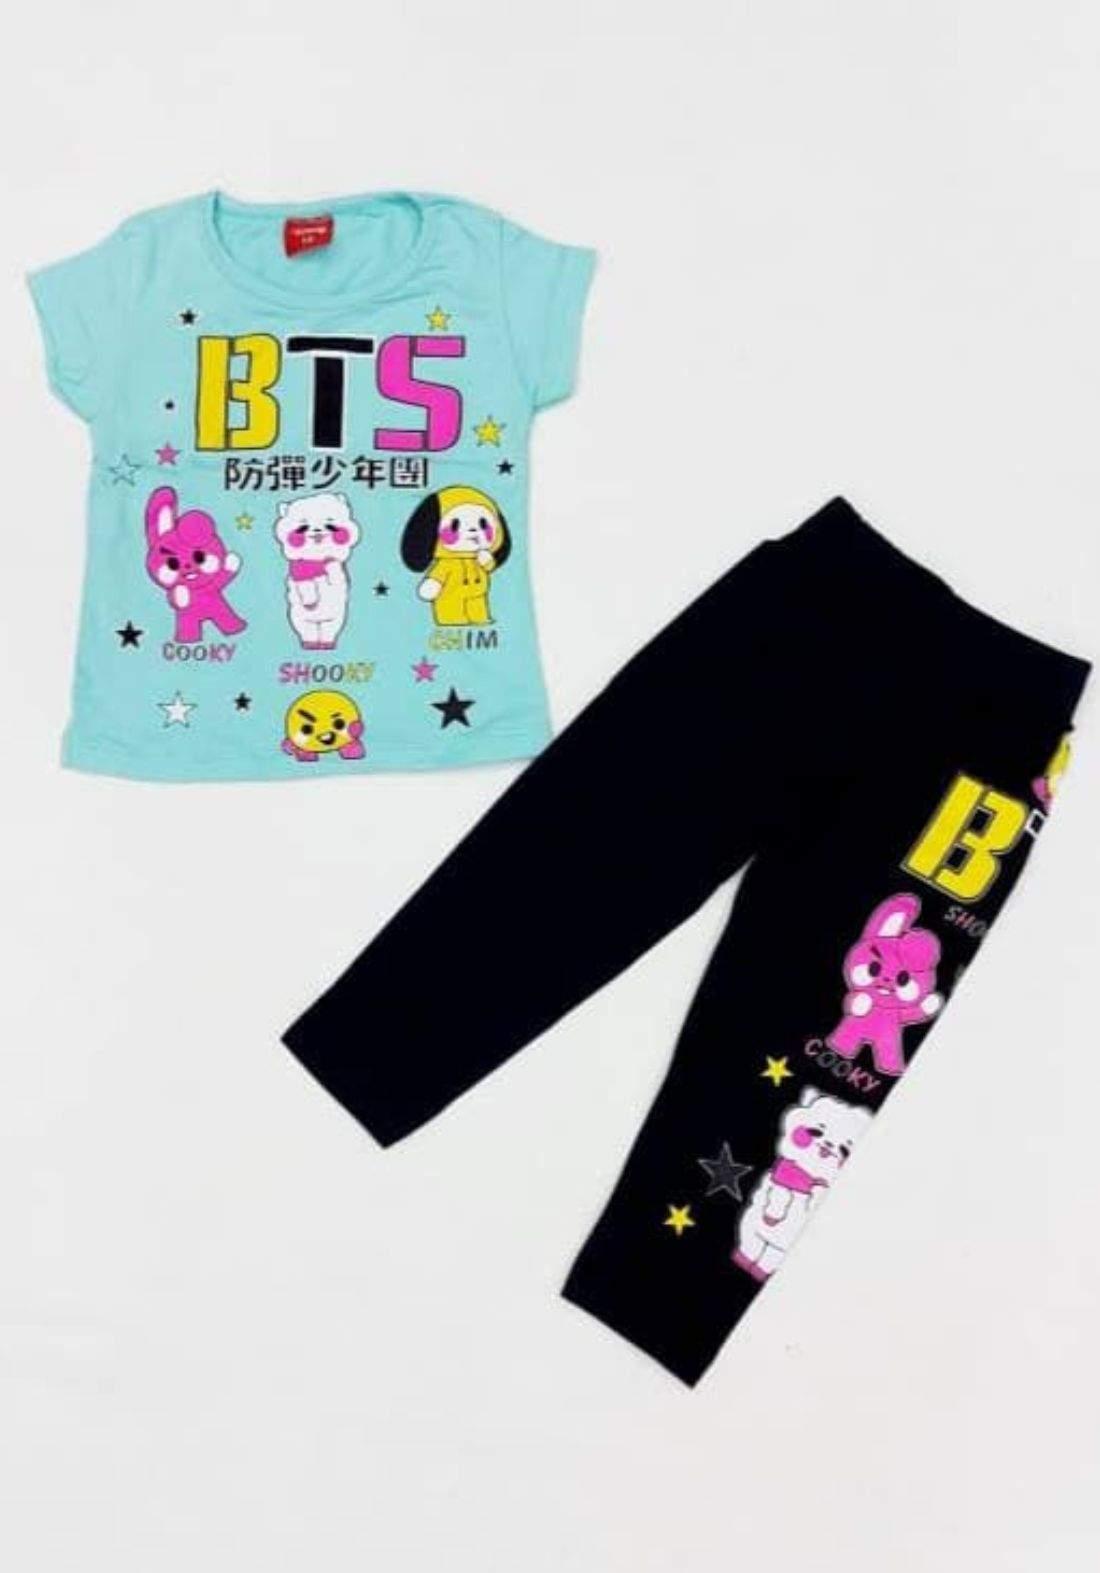 Tracksuit for girls green (t-shirt+pijamas) تراكسوت بناتي تركوازي (بجامة+تيشيرت)